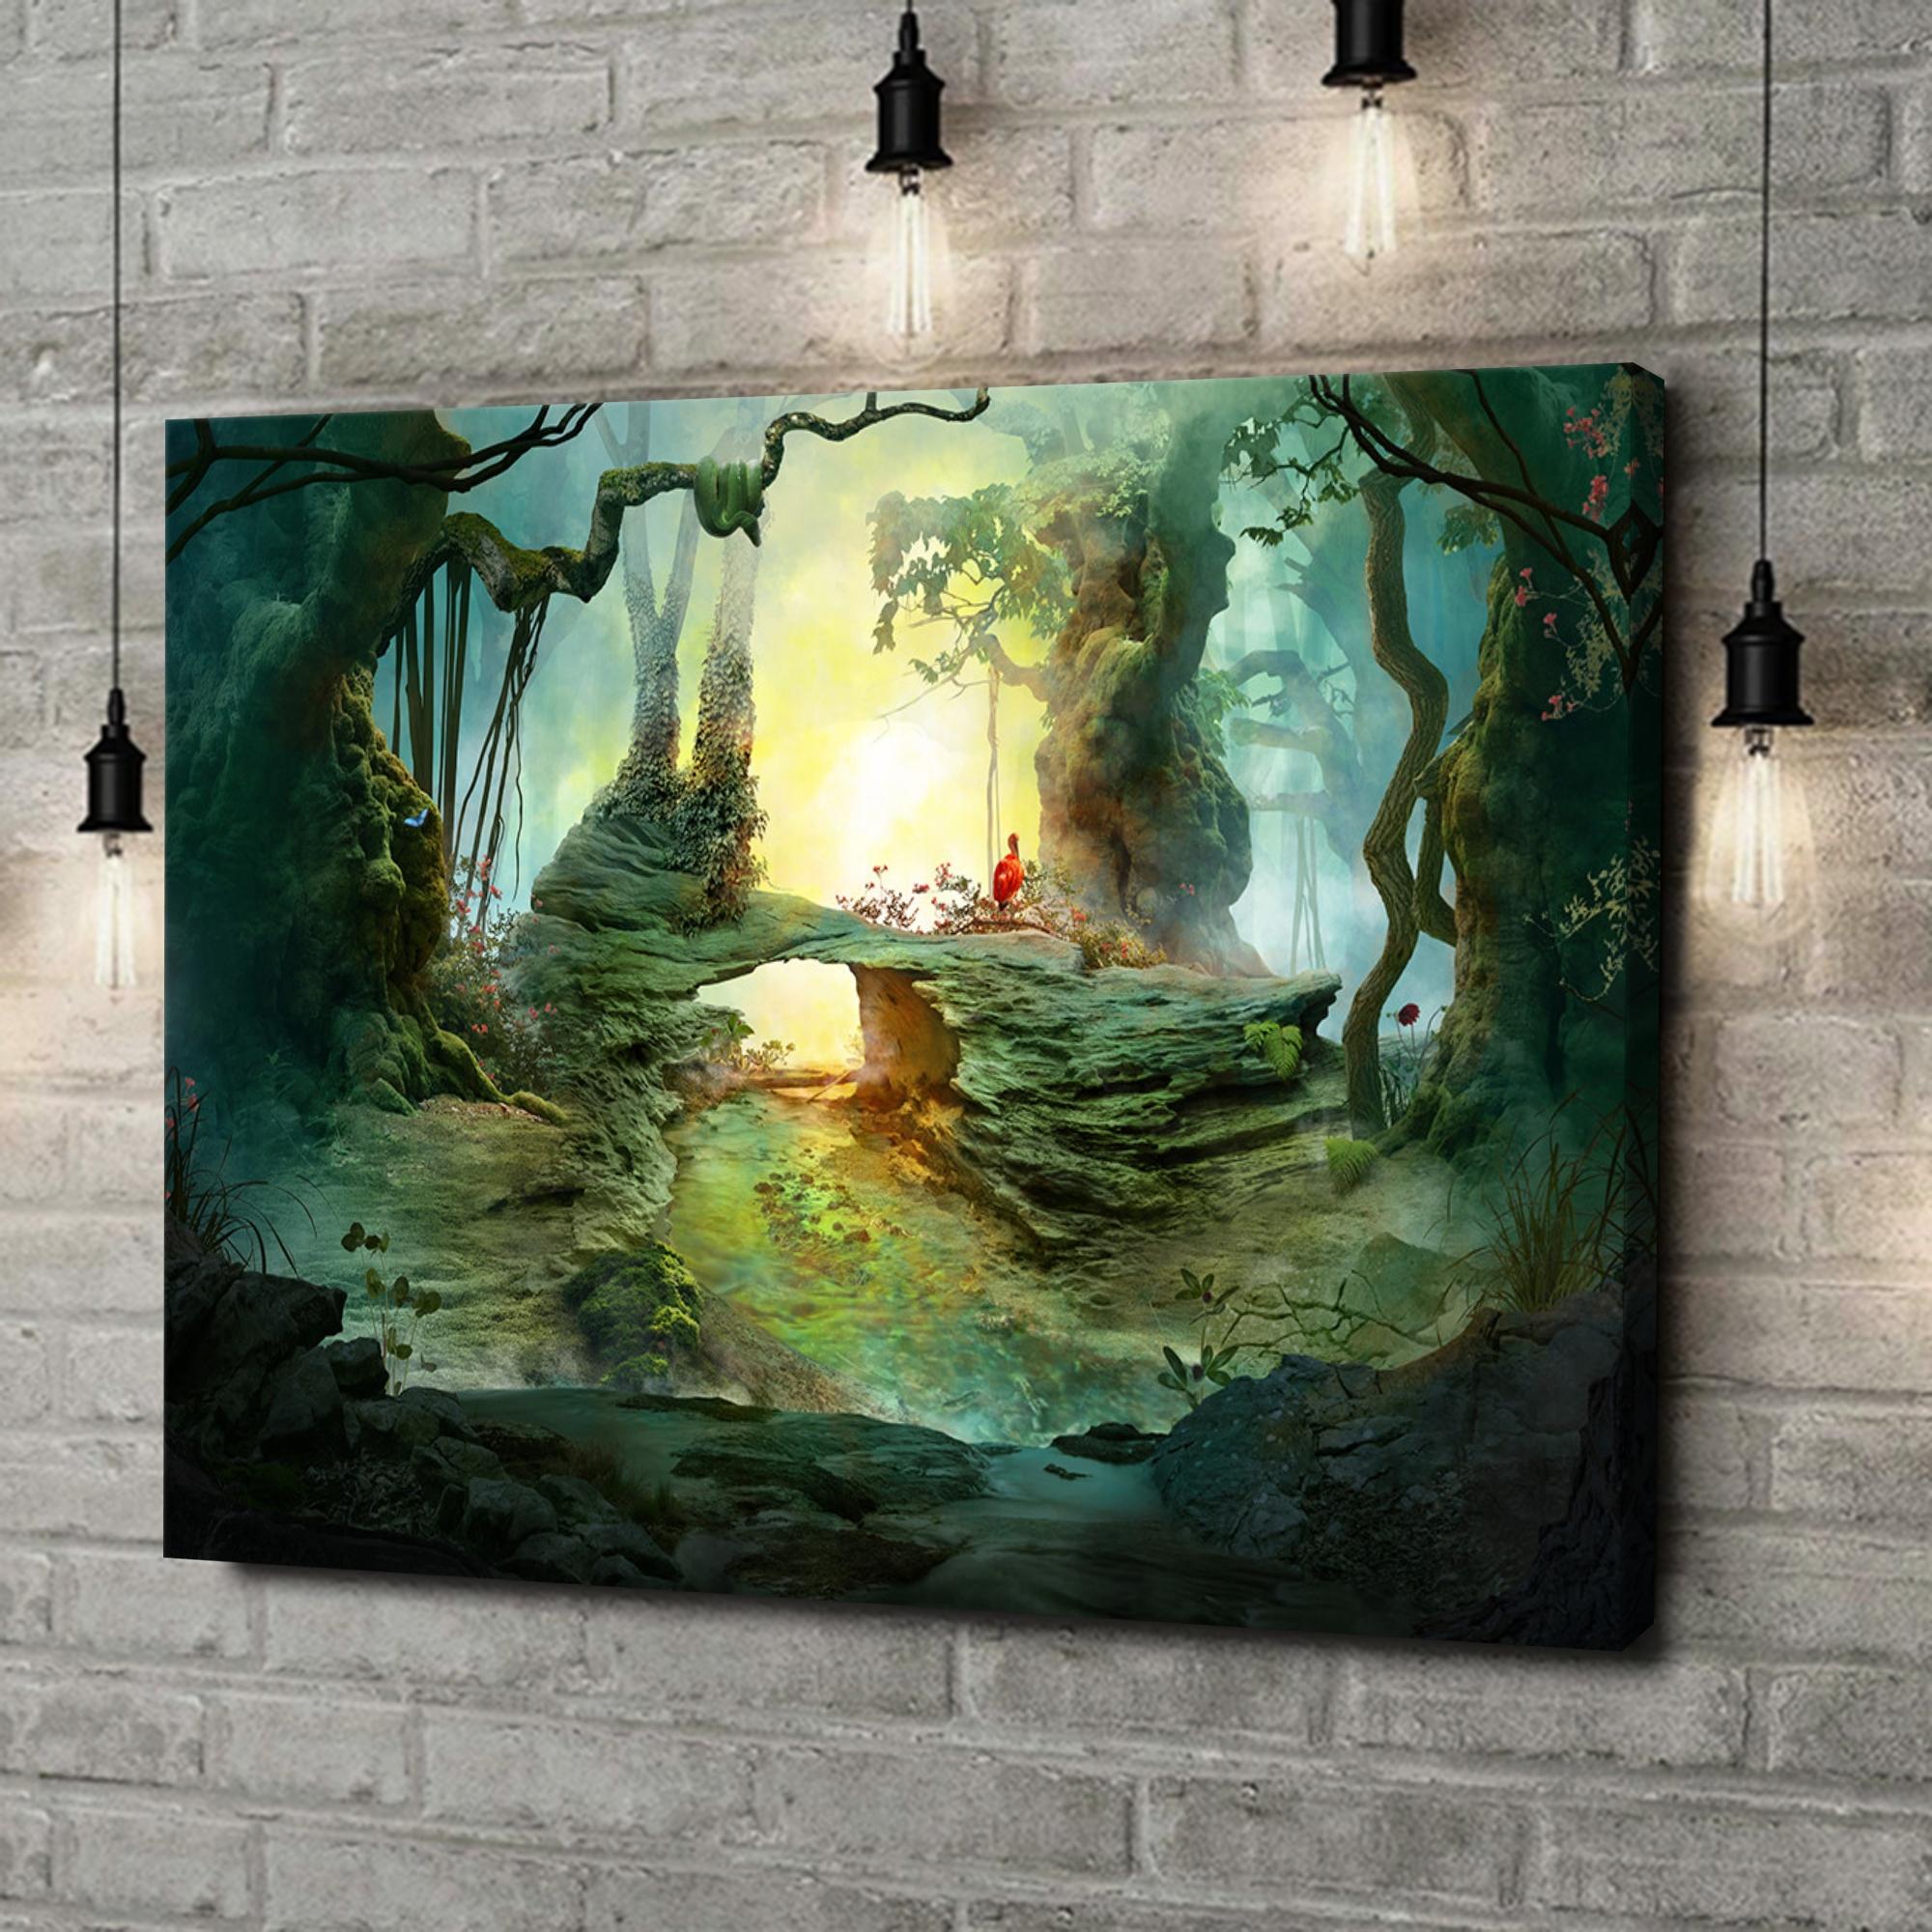 Leinwandbild personalisiert Fantasy Wald